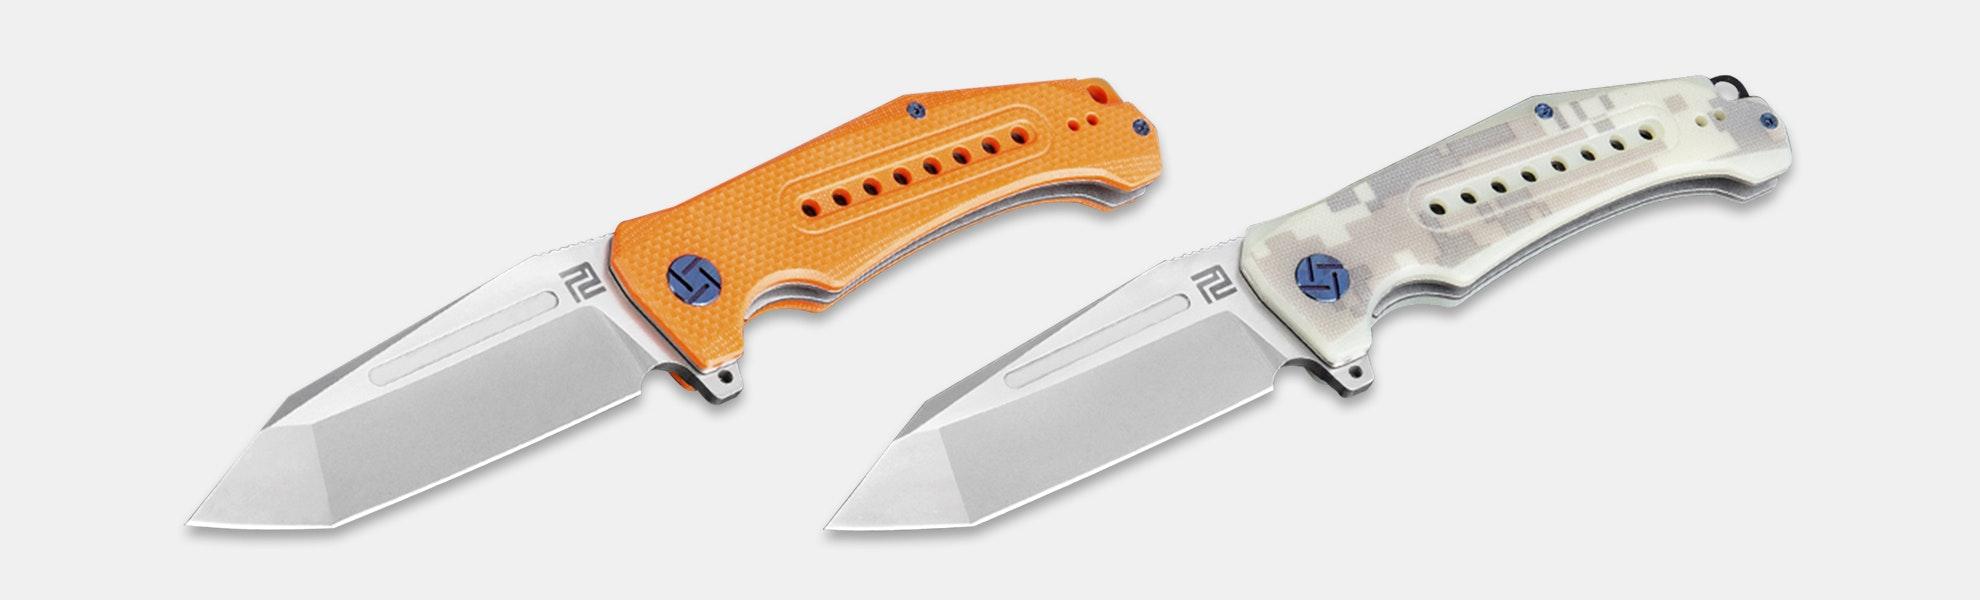 Artisan Cutlery Jungle Folding Knife